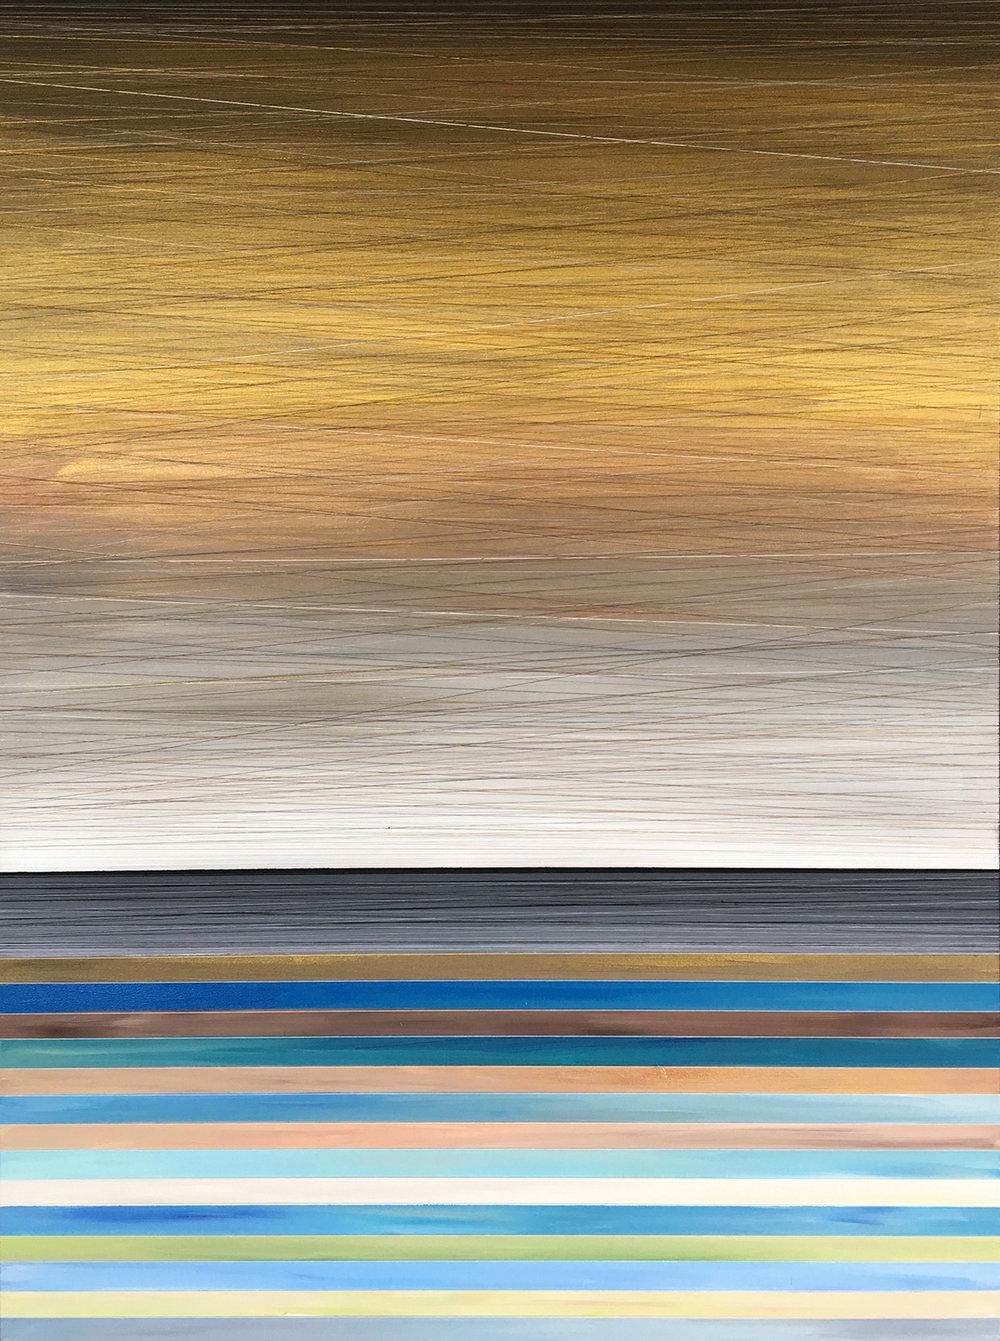 ETHEREAL LUMINOSITY 3. ACRYLIC & THREAD ON CANVAS. 36X48. 2017.